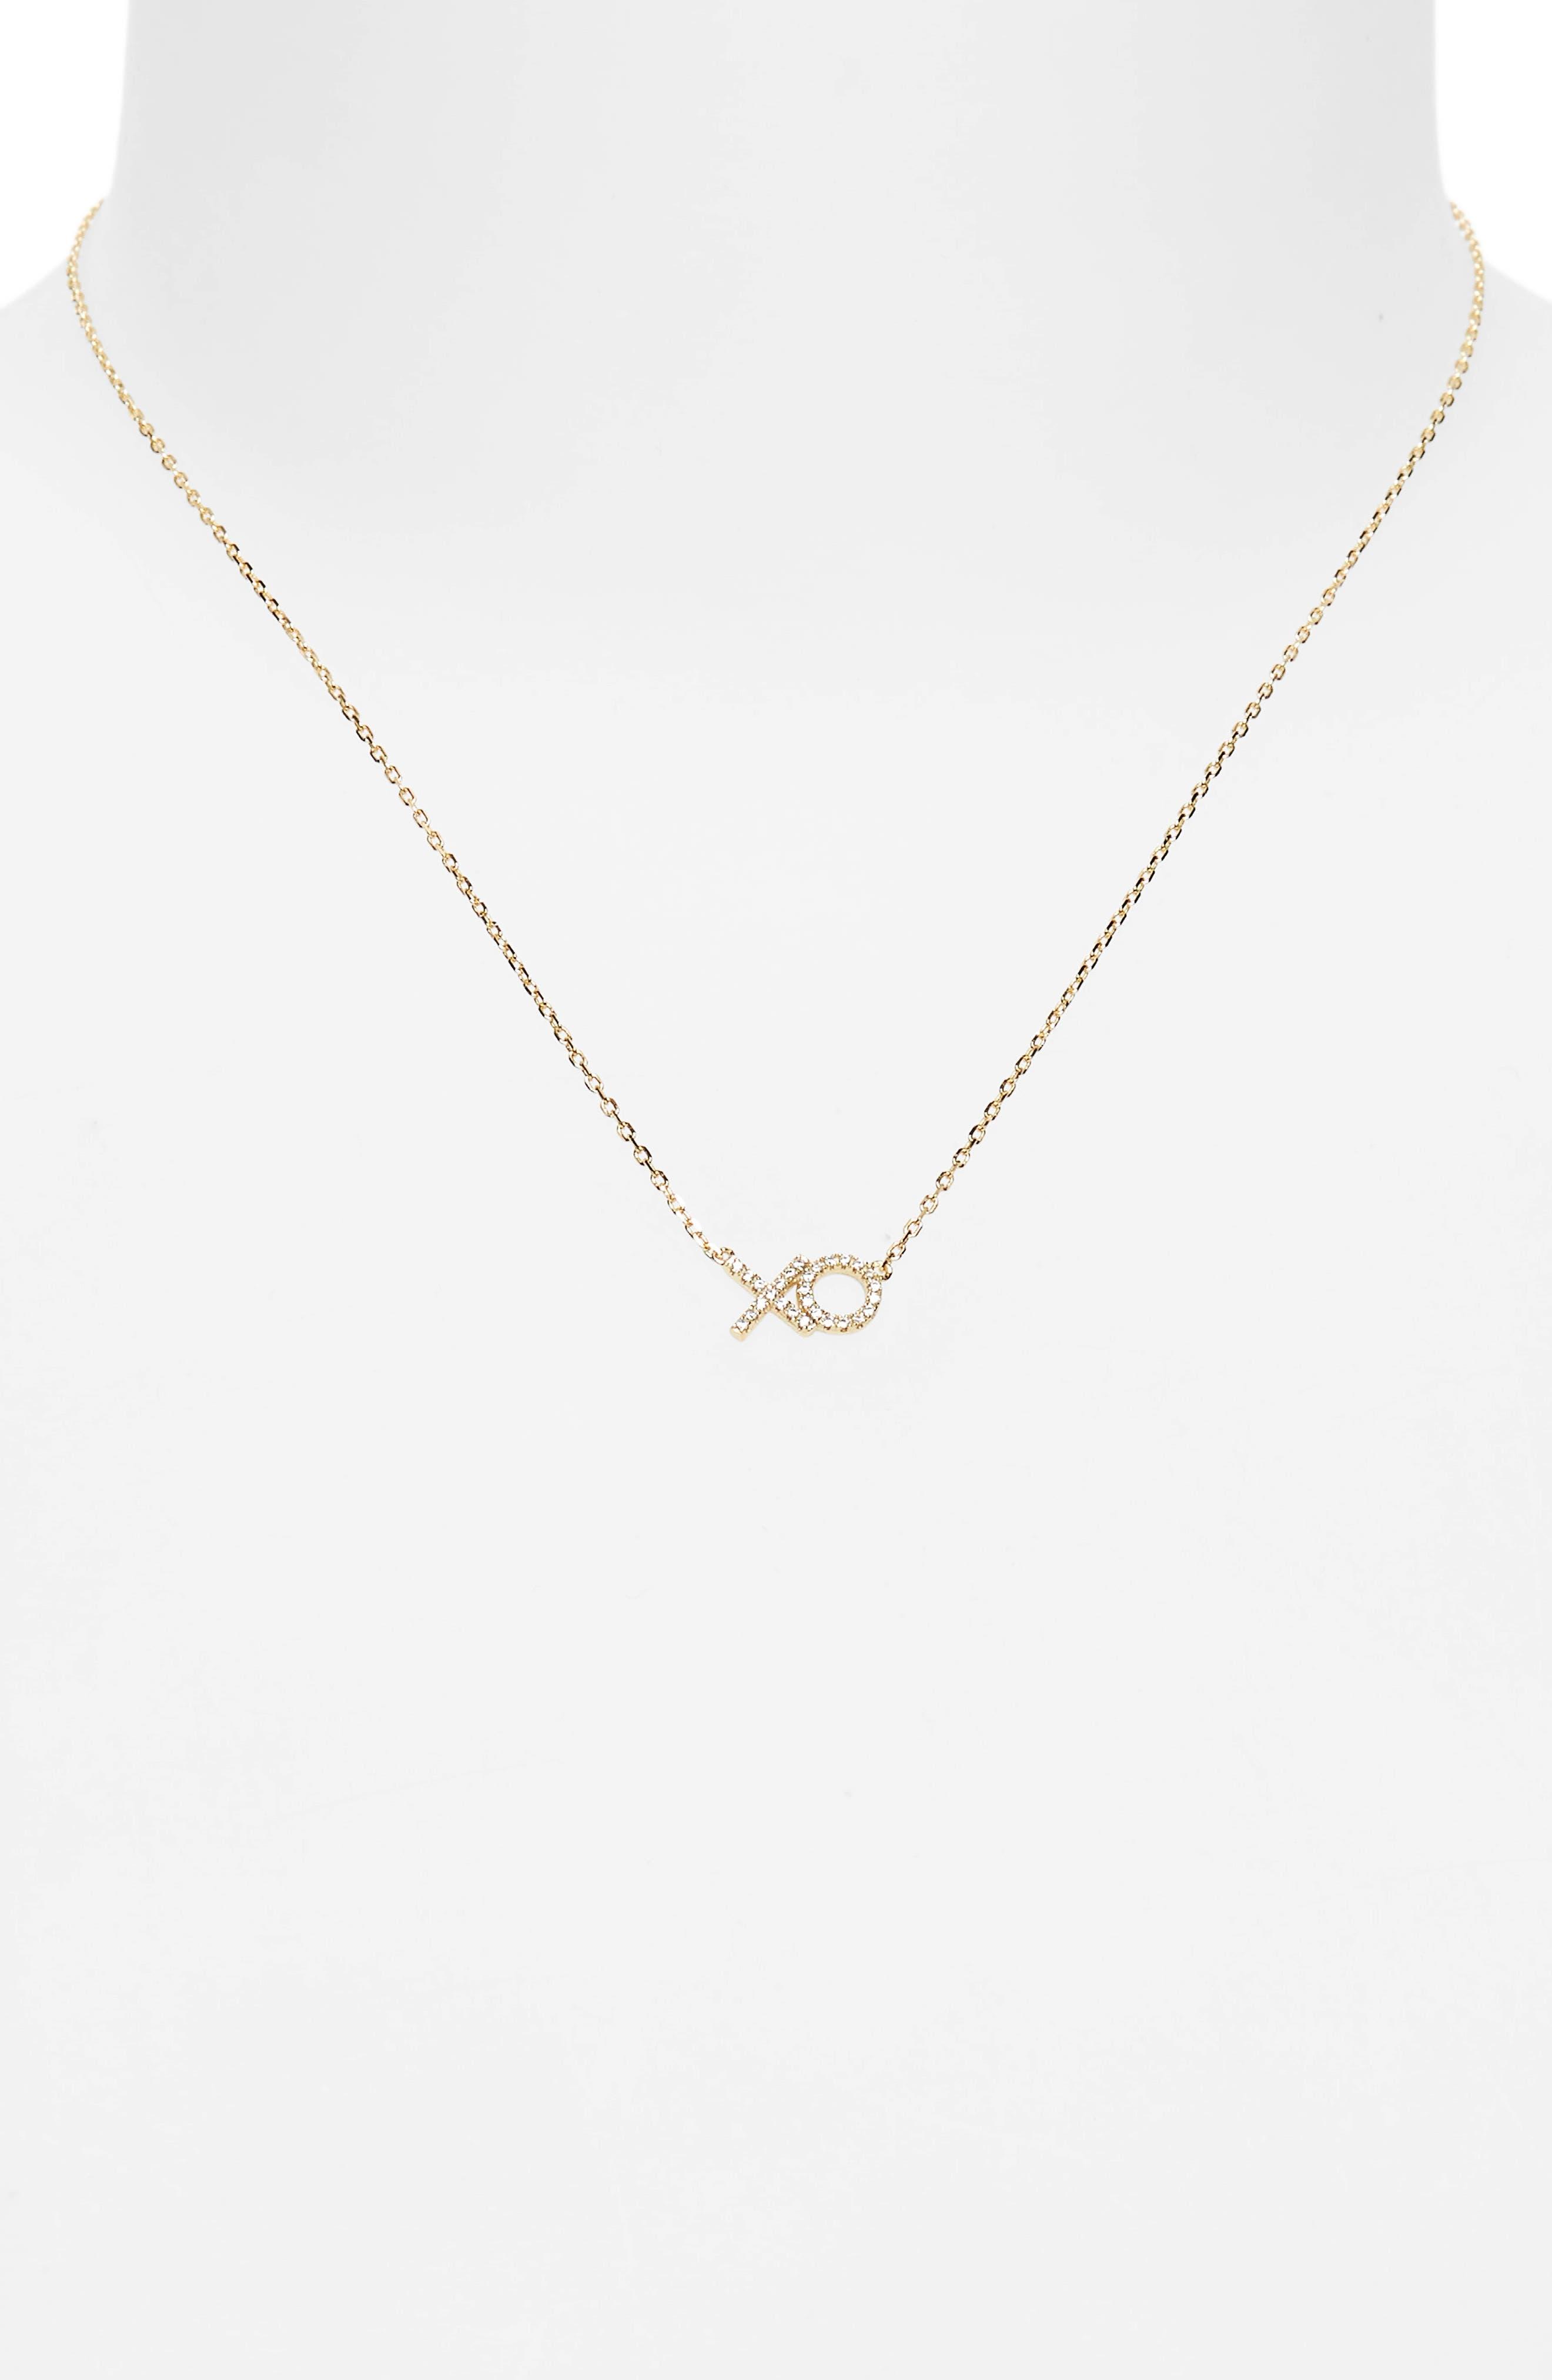 XO Pavé Pendant Necklace,                             Alternate thumbnail 2, color,                             Yellow Gold